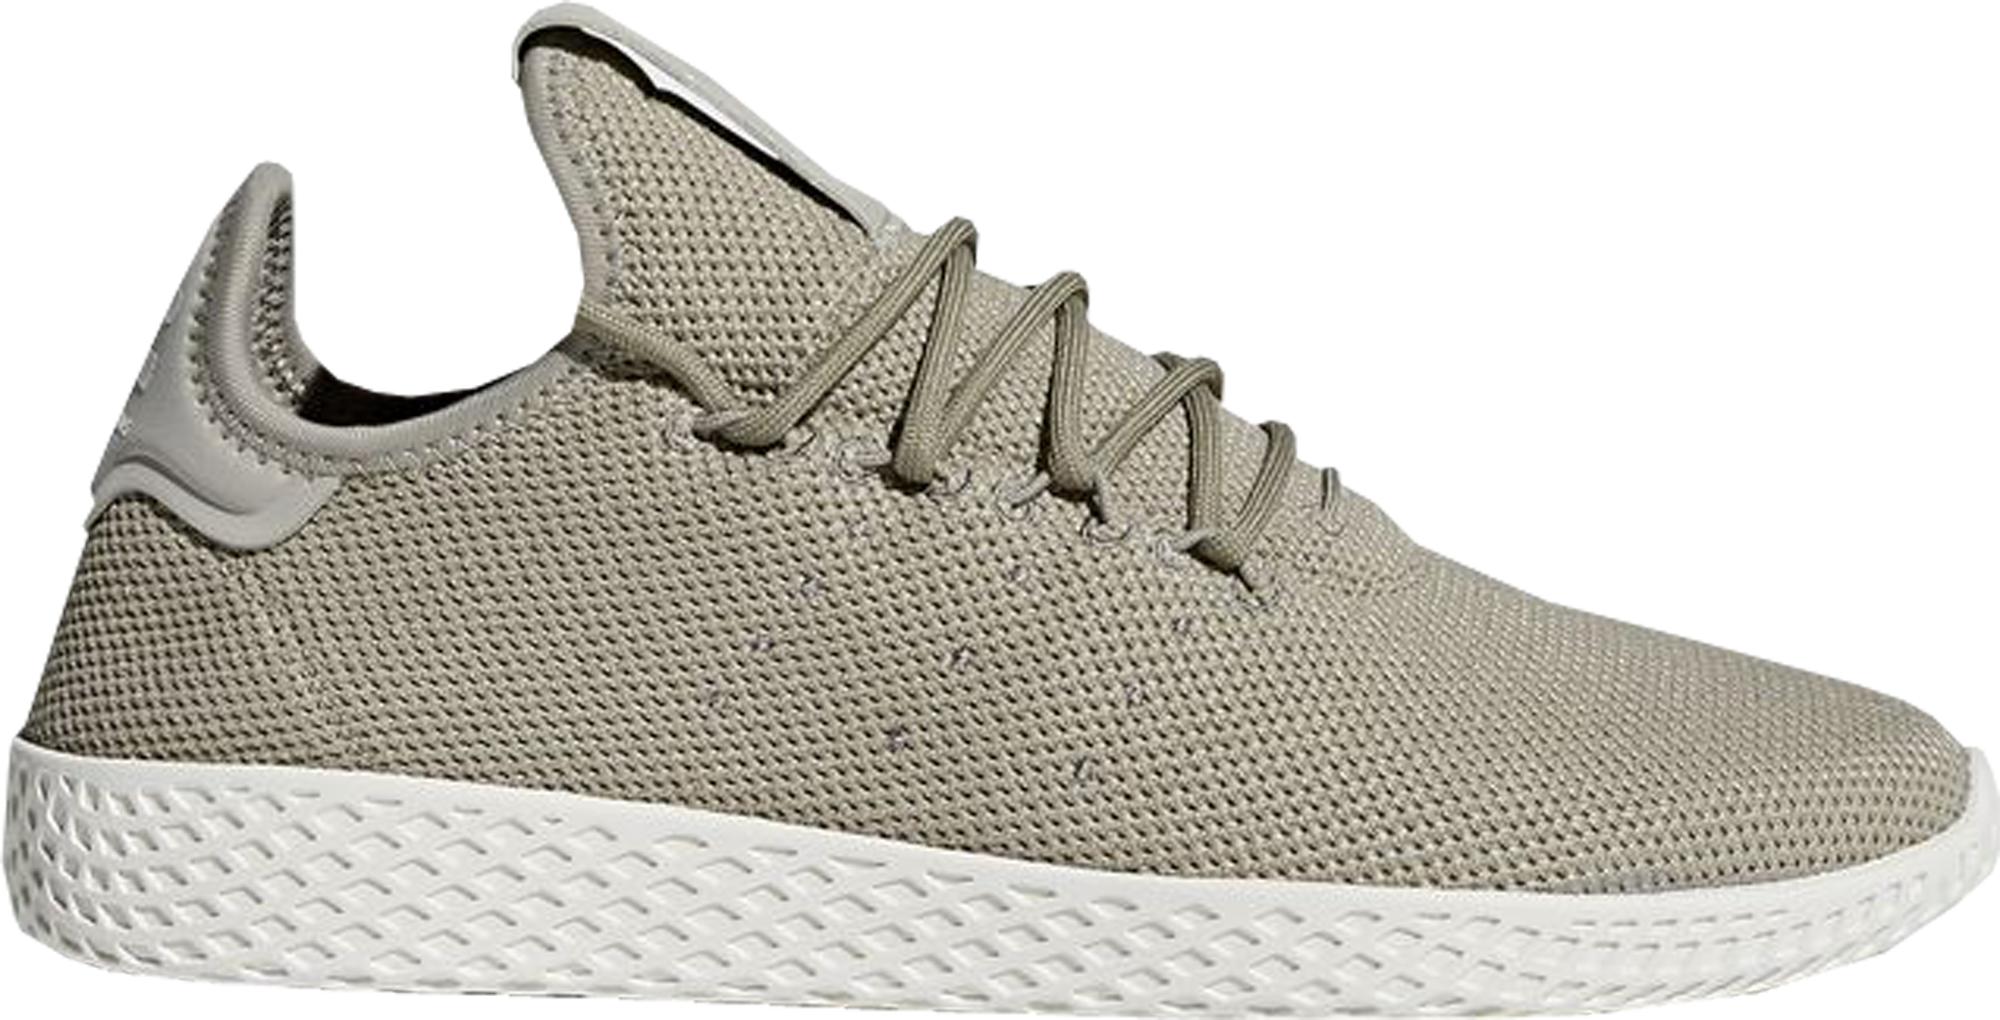 adidas Tennis HU Pharrell Beige - CQ2163